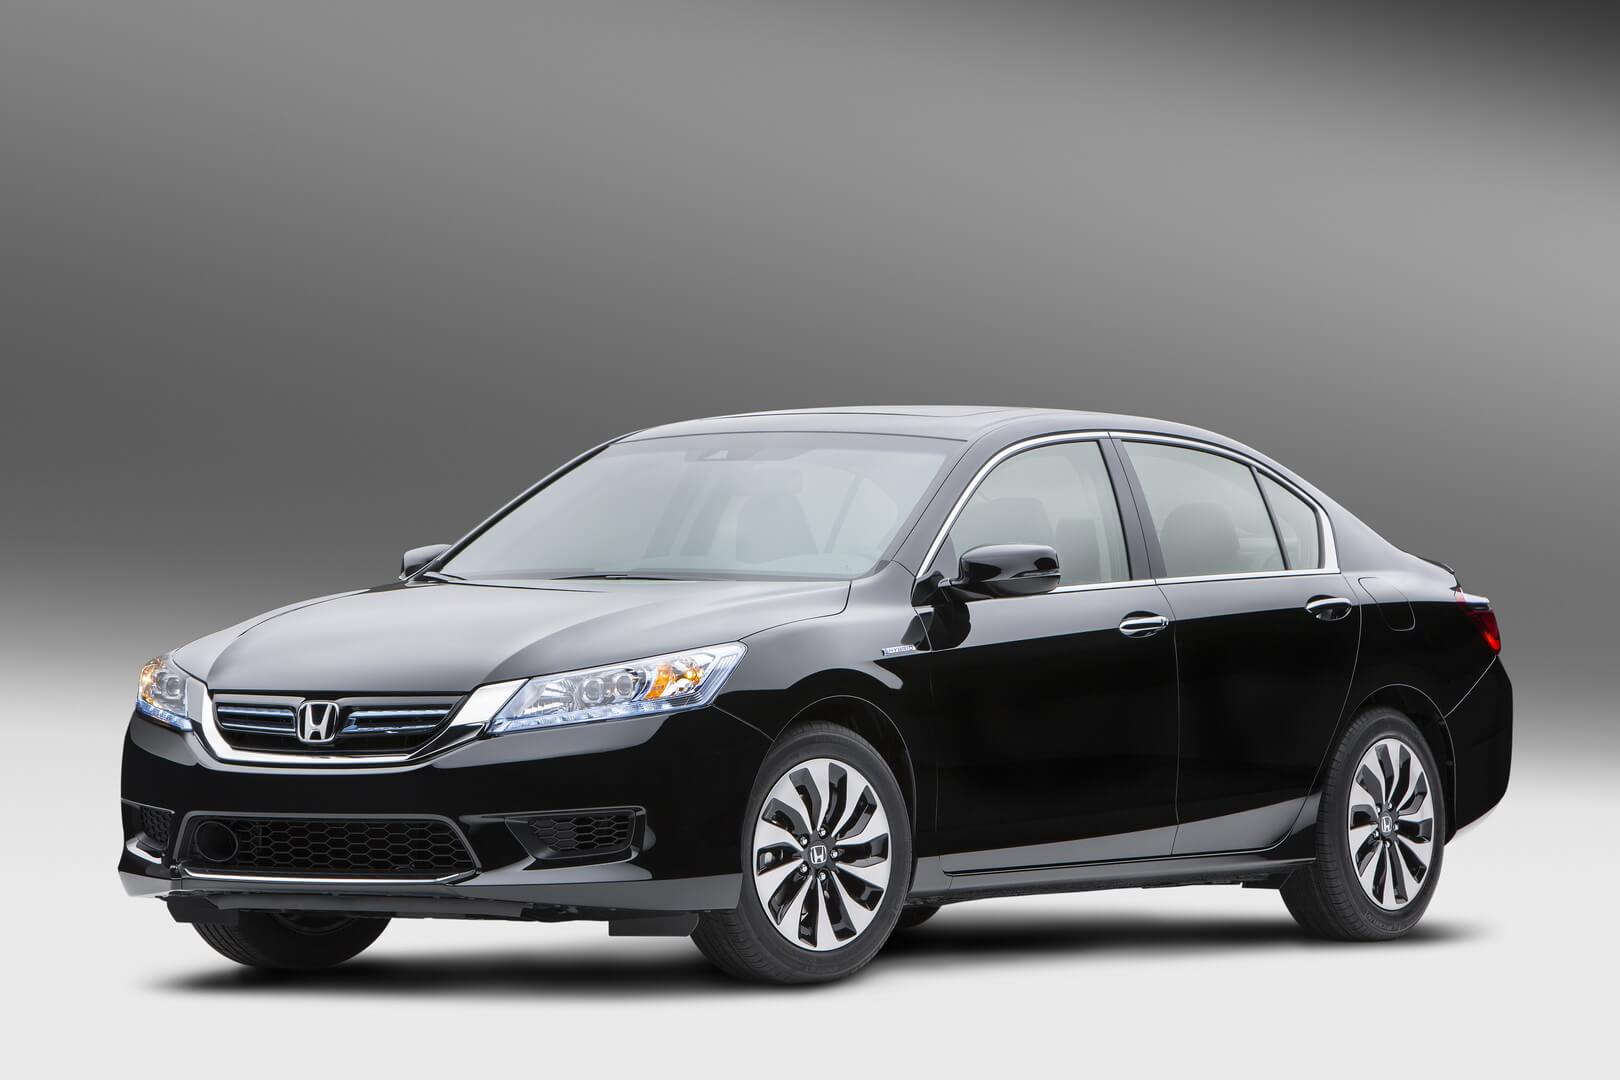 Фотография экоавто Honda Accord Hybrid 2014 - фото 2